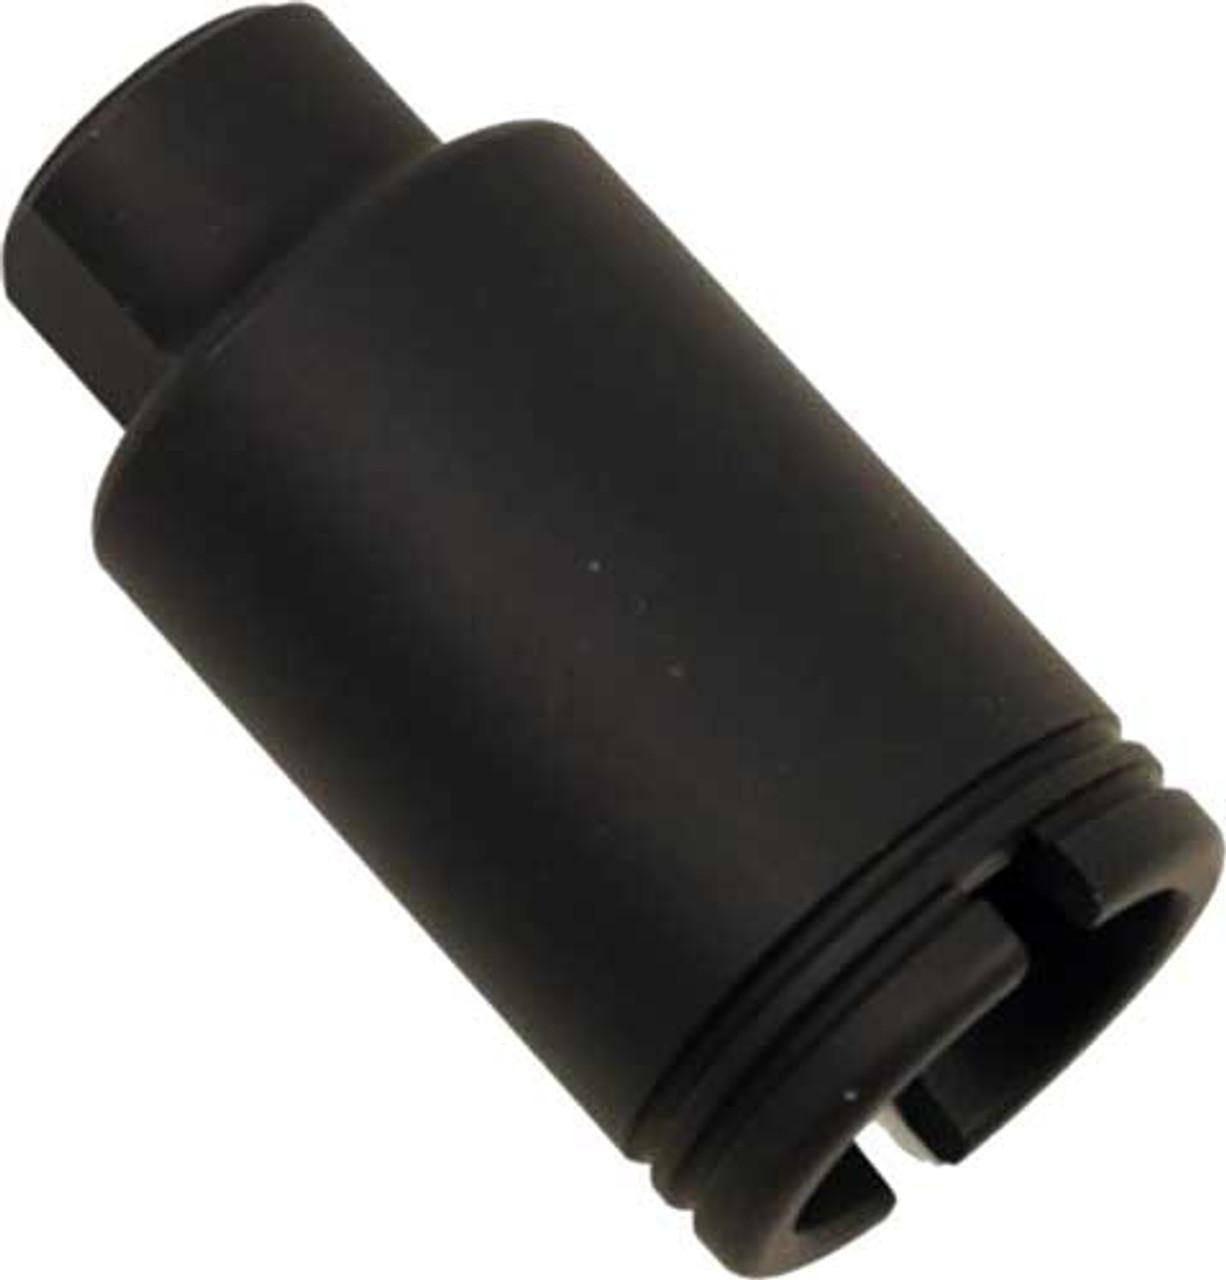 Guntec Ar15 Micro Flash Can Slim Profile Black